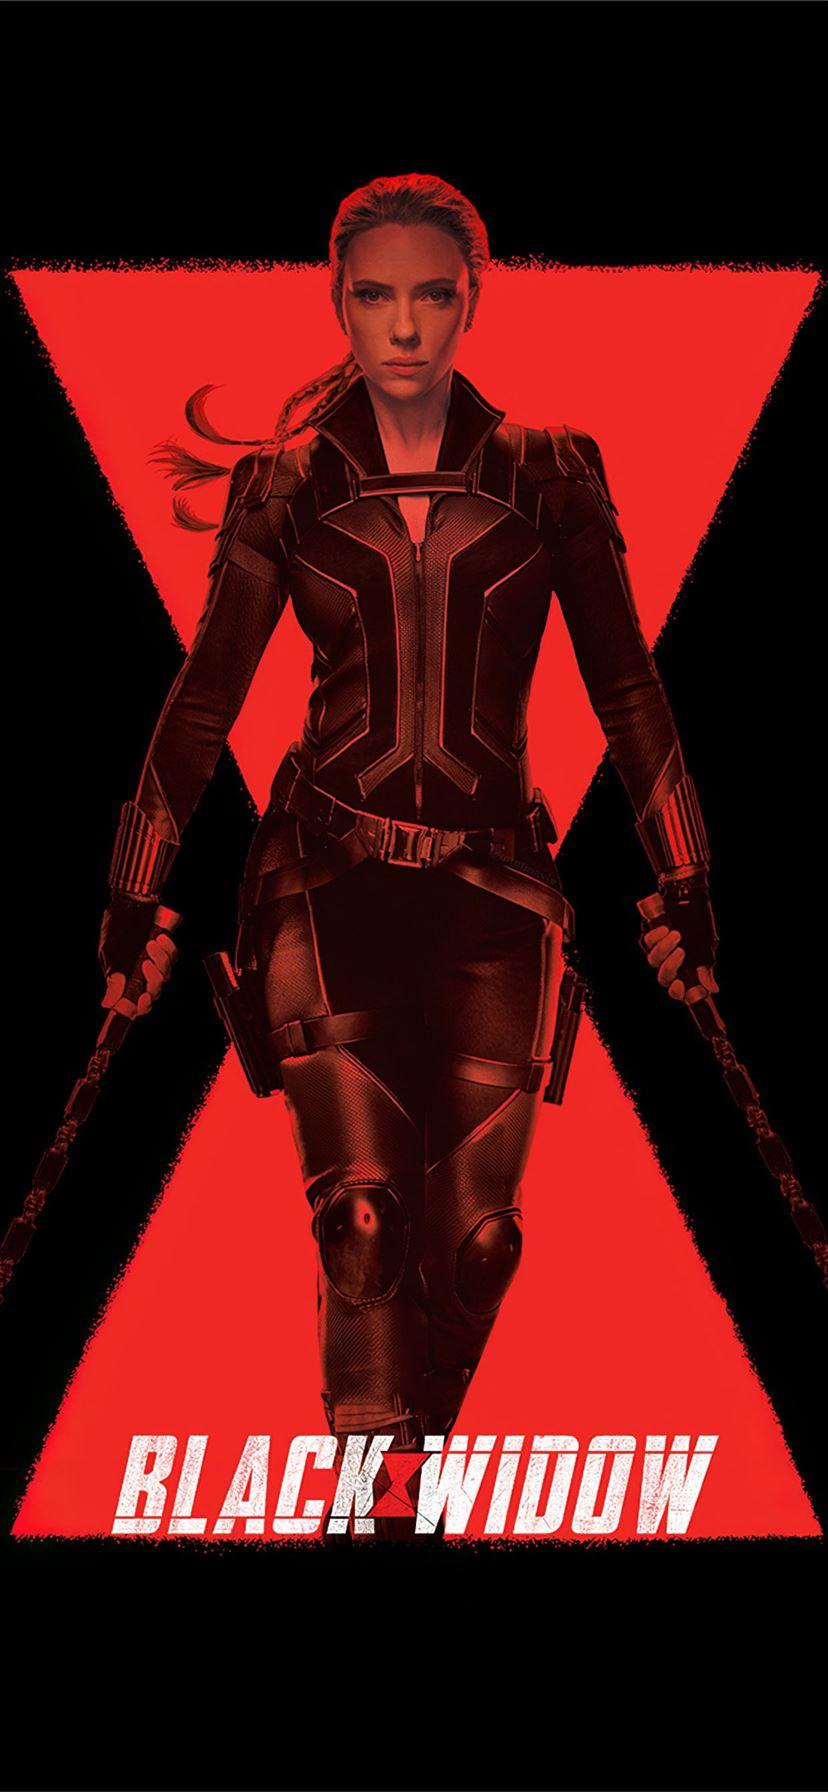 Black Widow 2020 Movie 4k Iphone 11 Wallpapers Free Download